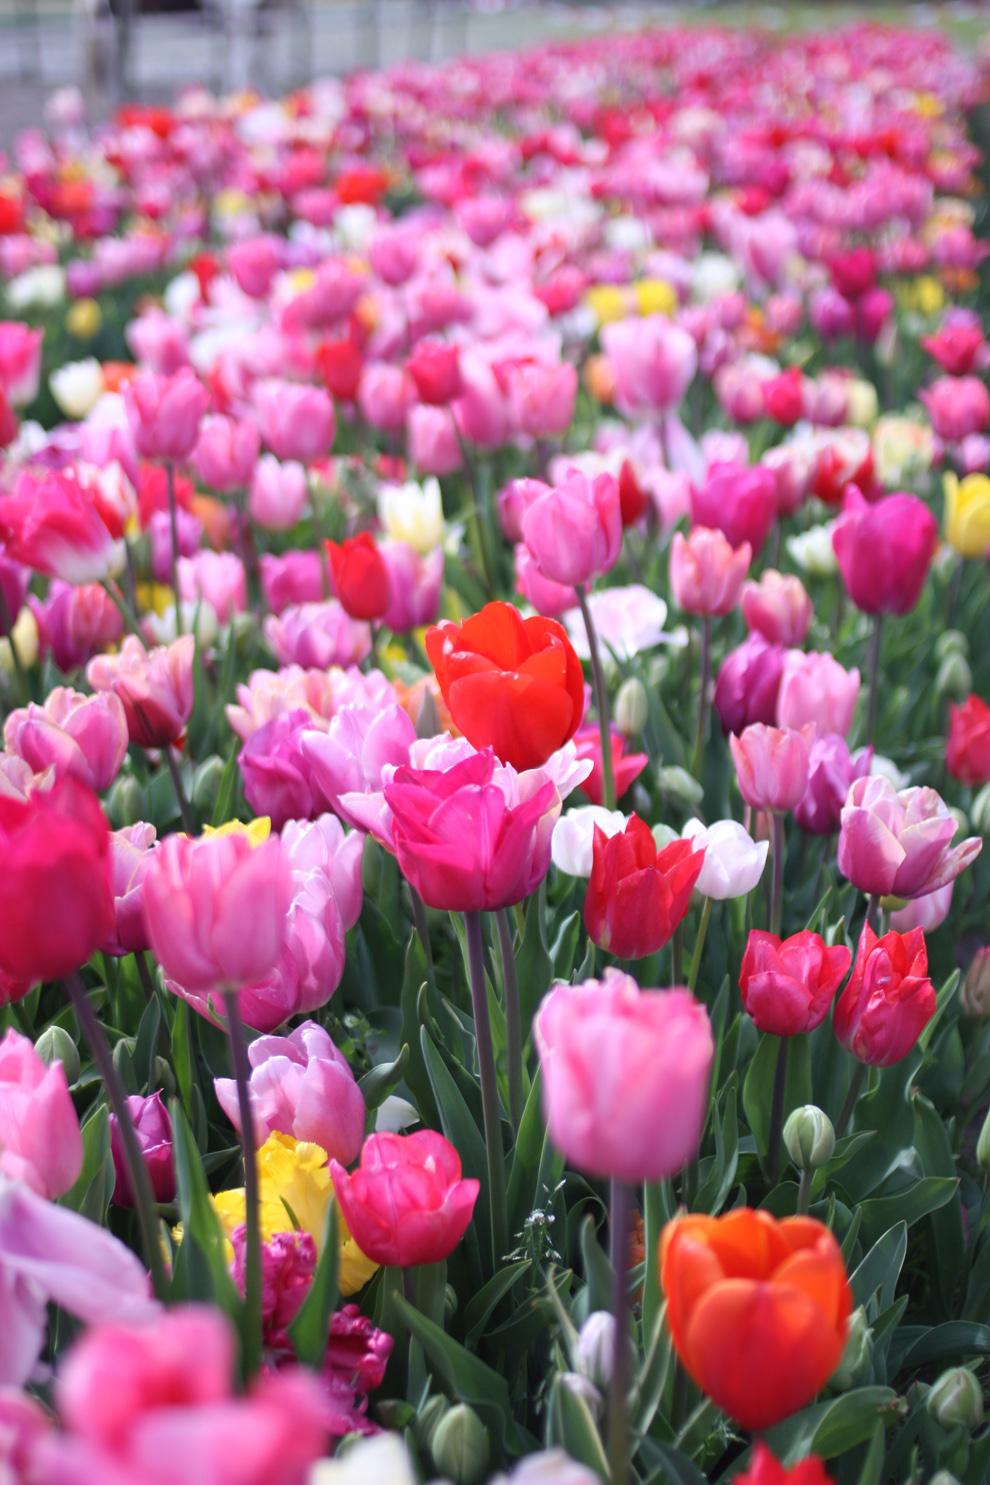 Keukenhof14__Annemiekes_Pluktuin_pnik_tulips1.jpg